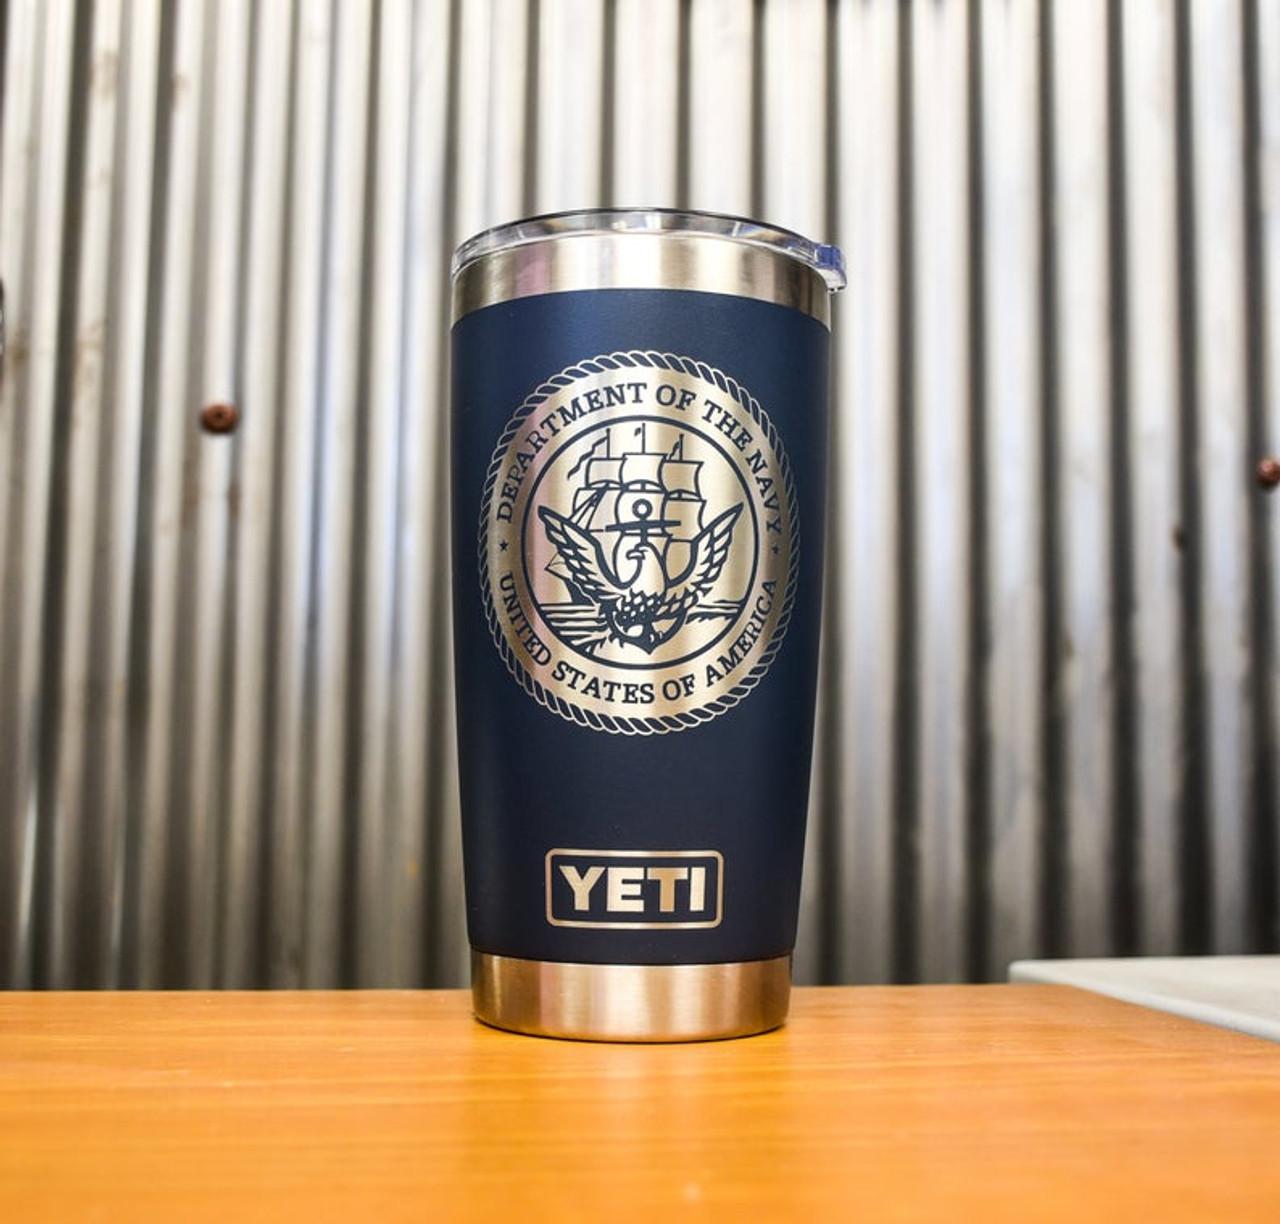 Department of the Navy Yeti Rambler